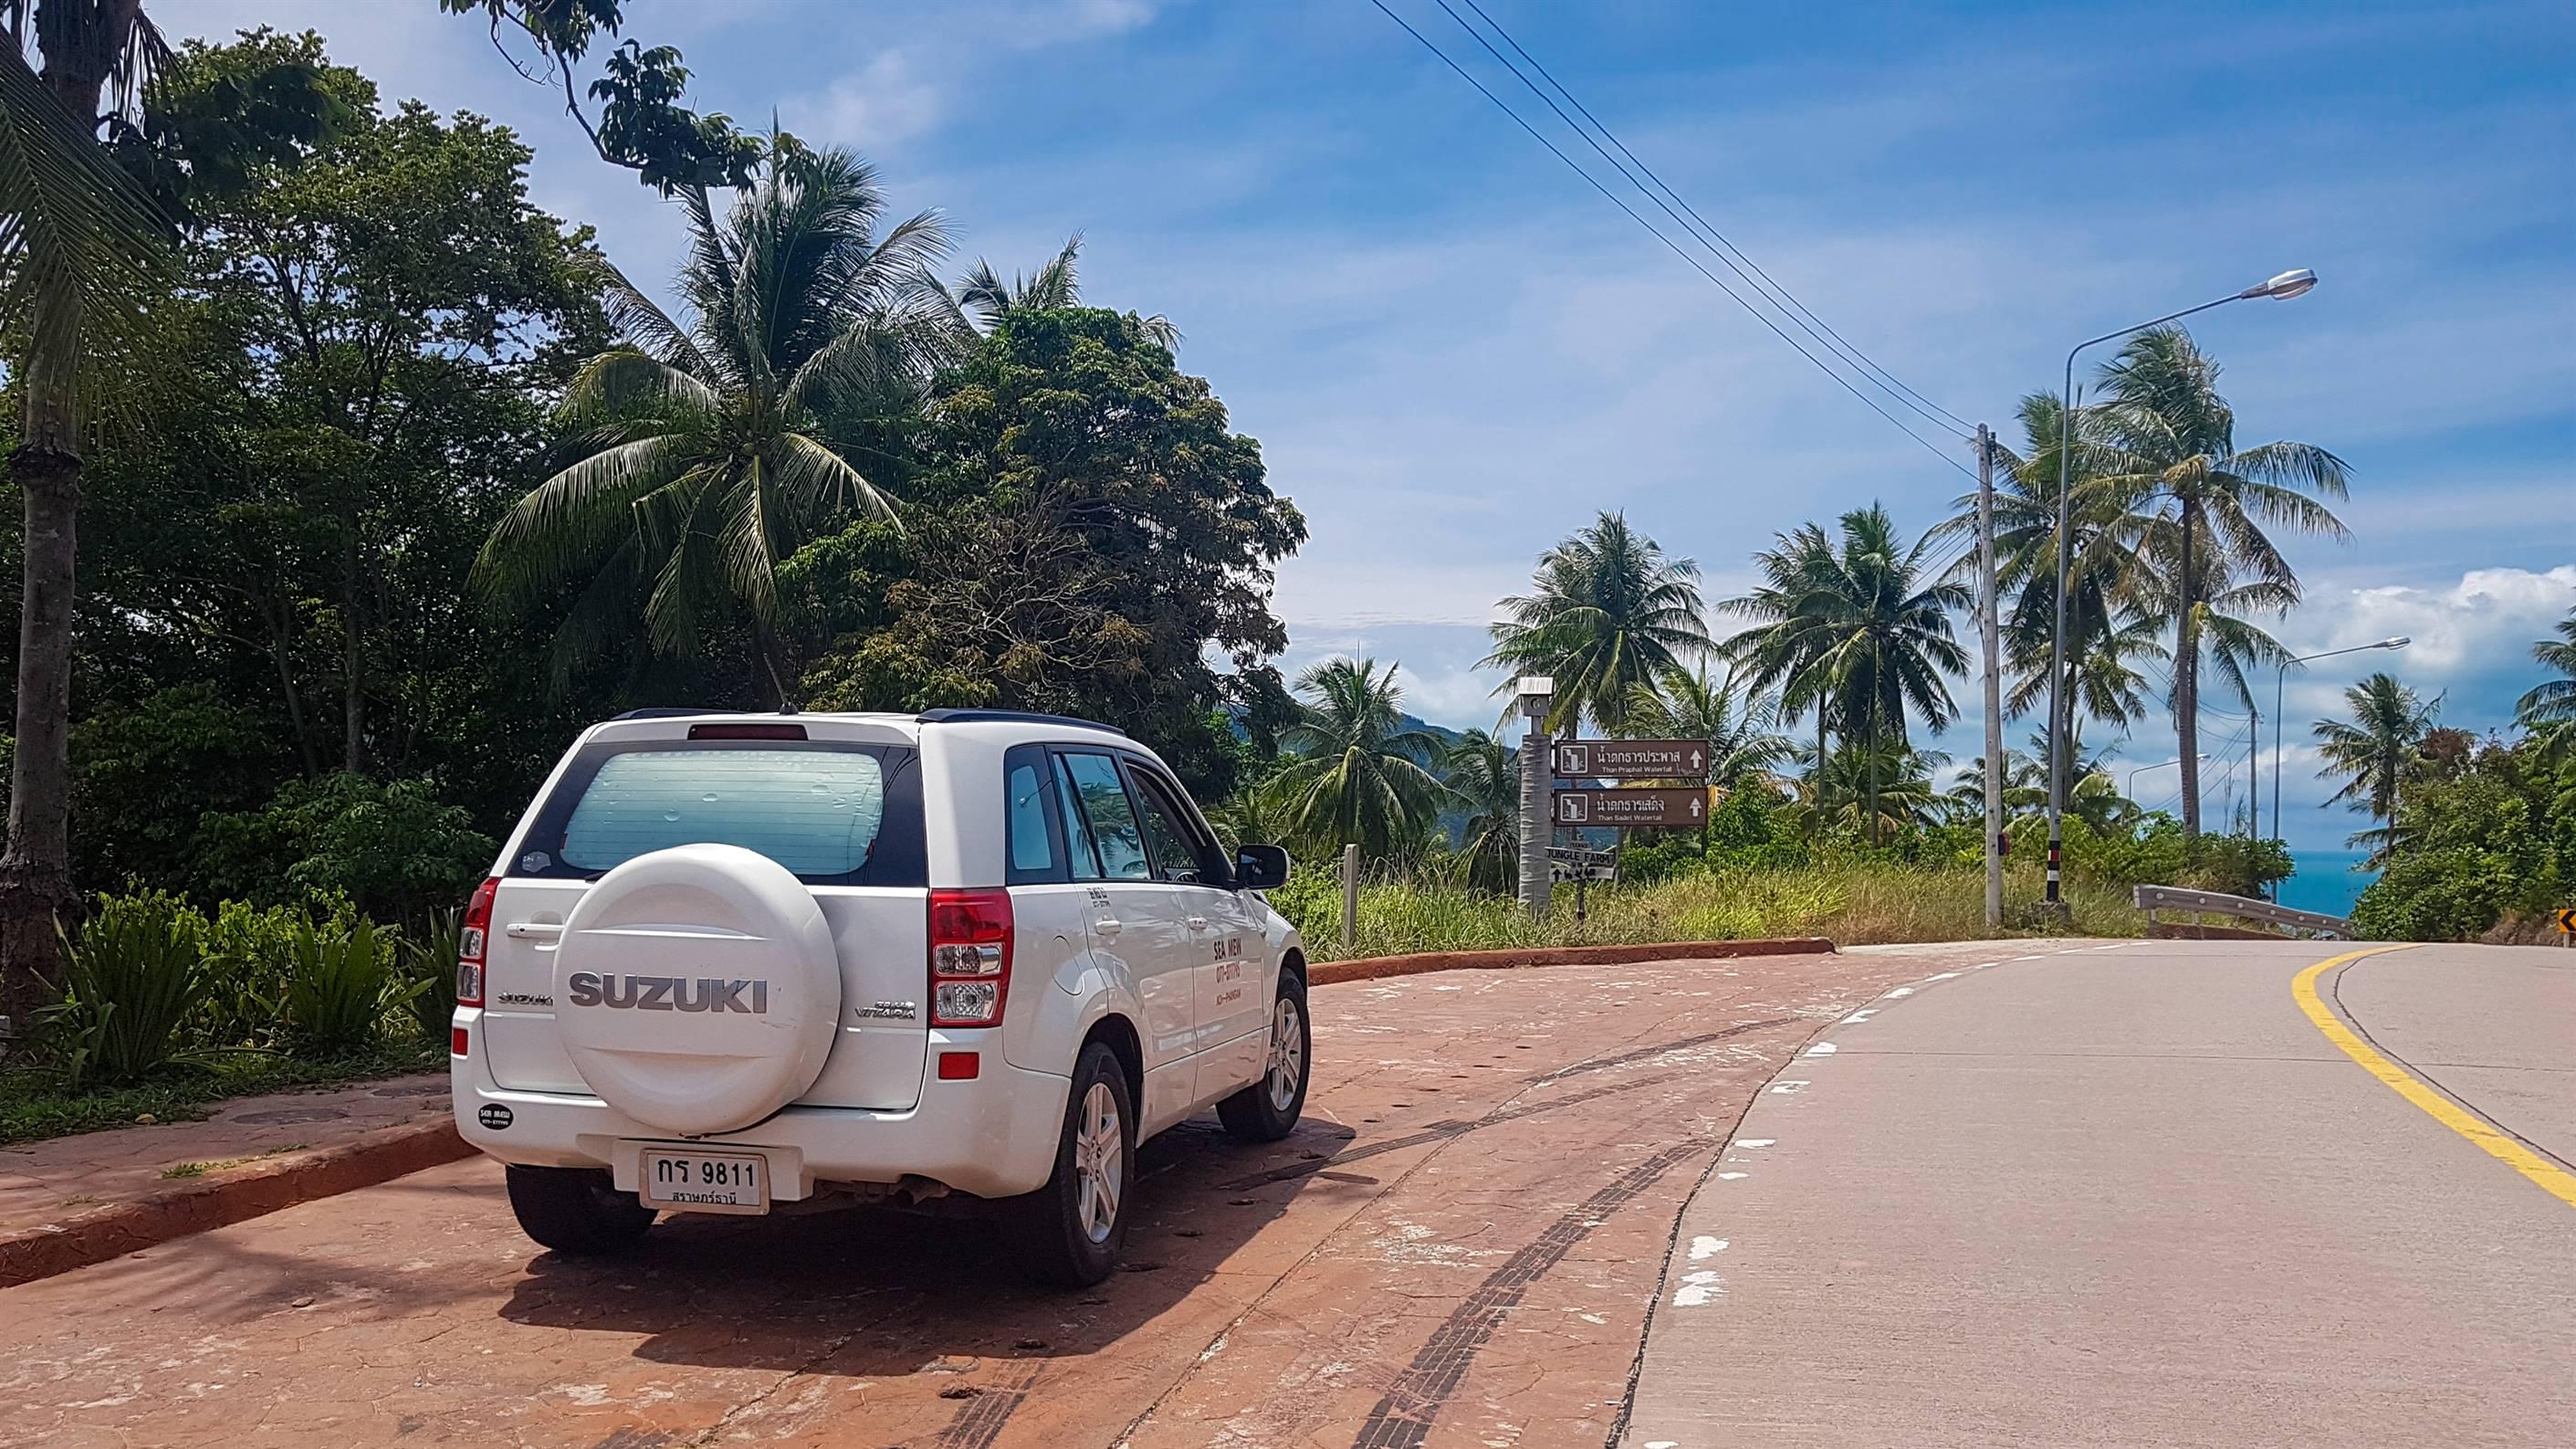 location de voiture Koh Phangan, Thaïlande